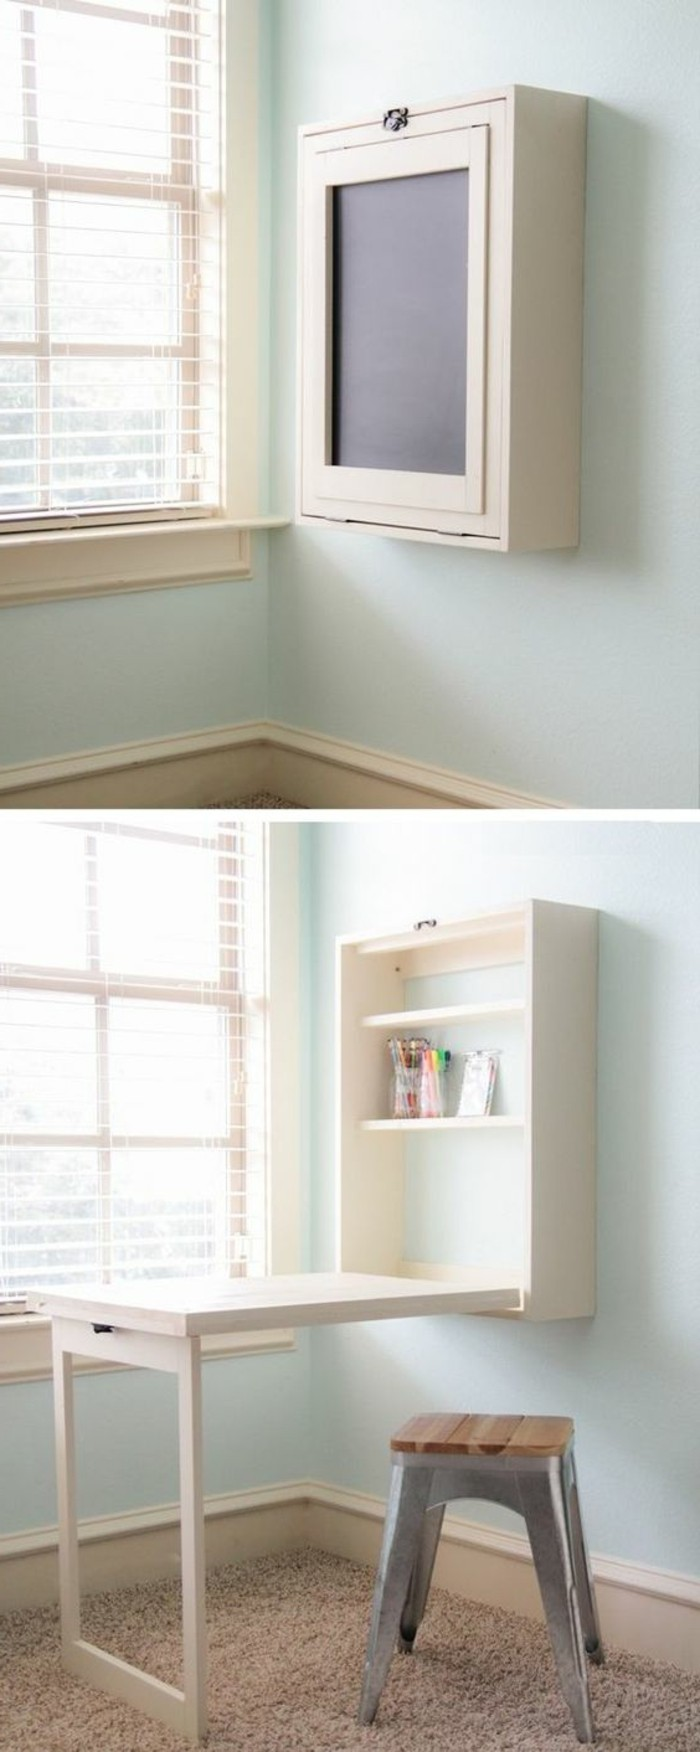 bureau design bois clair. Black Bedroom Furniture Sets. Home Design Ideas